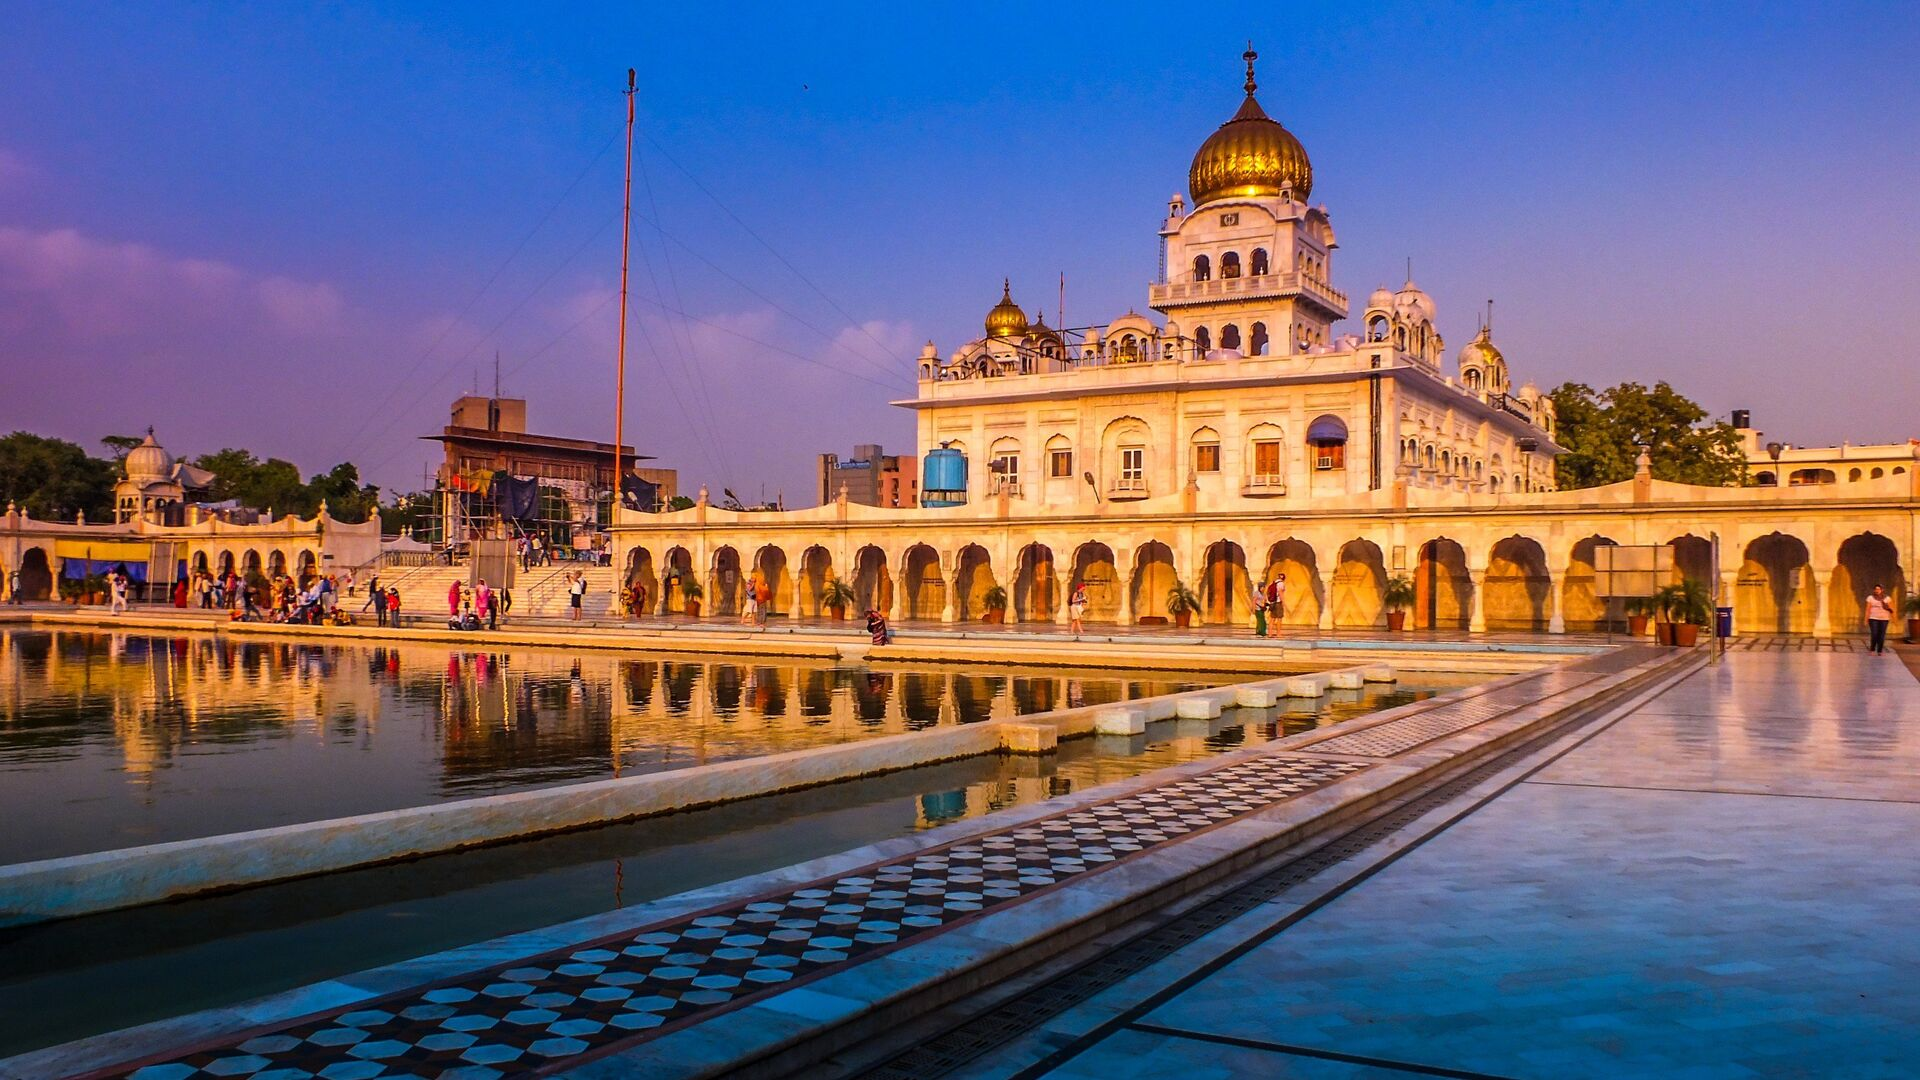 Nueva Delhi, la capital de la India - Sputnik Mundo, 1920, 28.06.2021